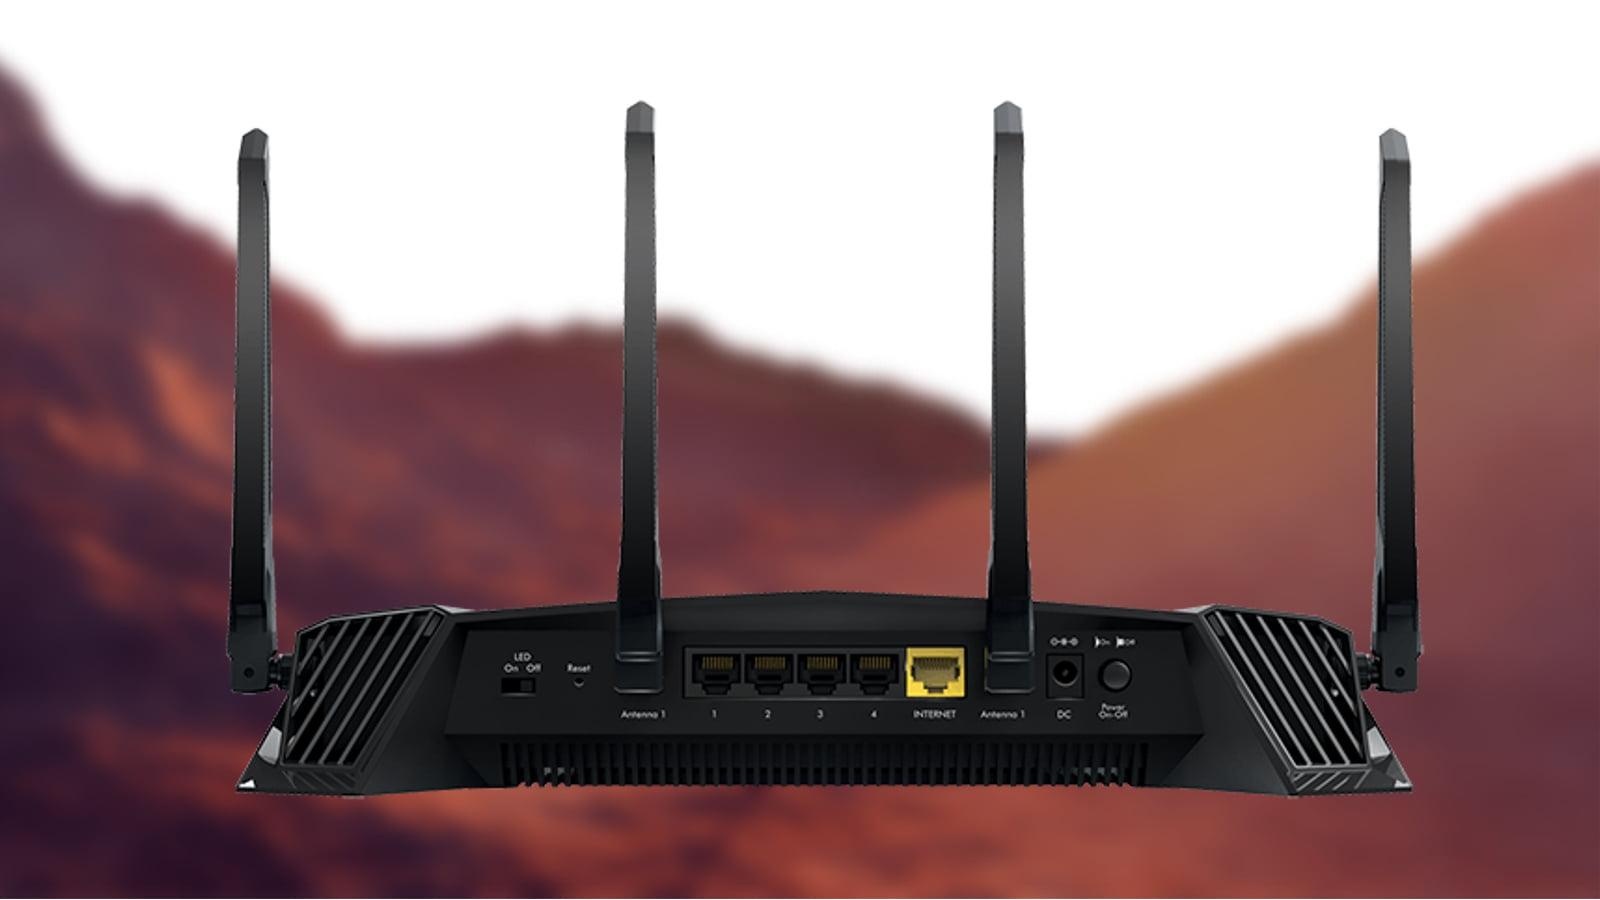 netgear-store-nighthawk-pro-xr500-gaming-wifi-router-ac2600-dumaos-電競-路由器